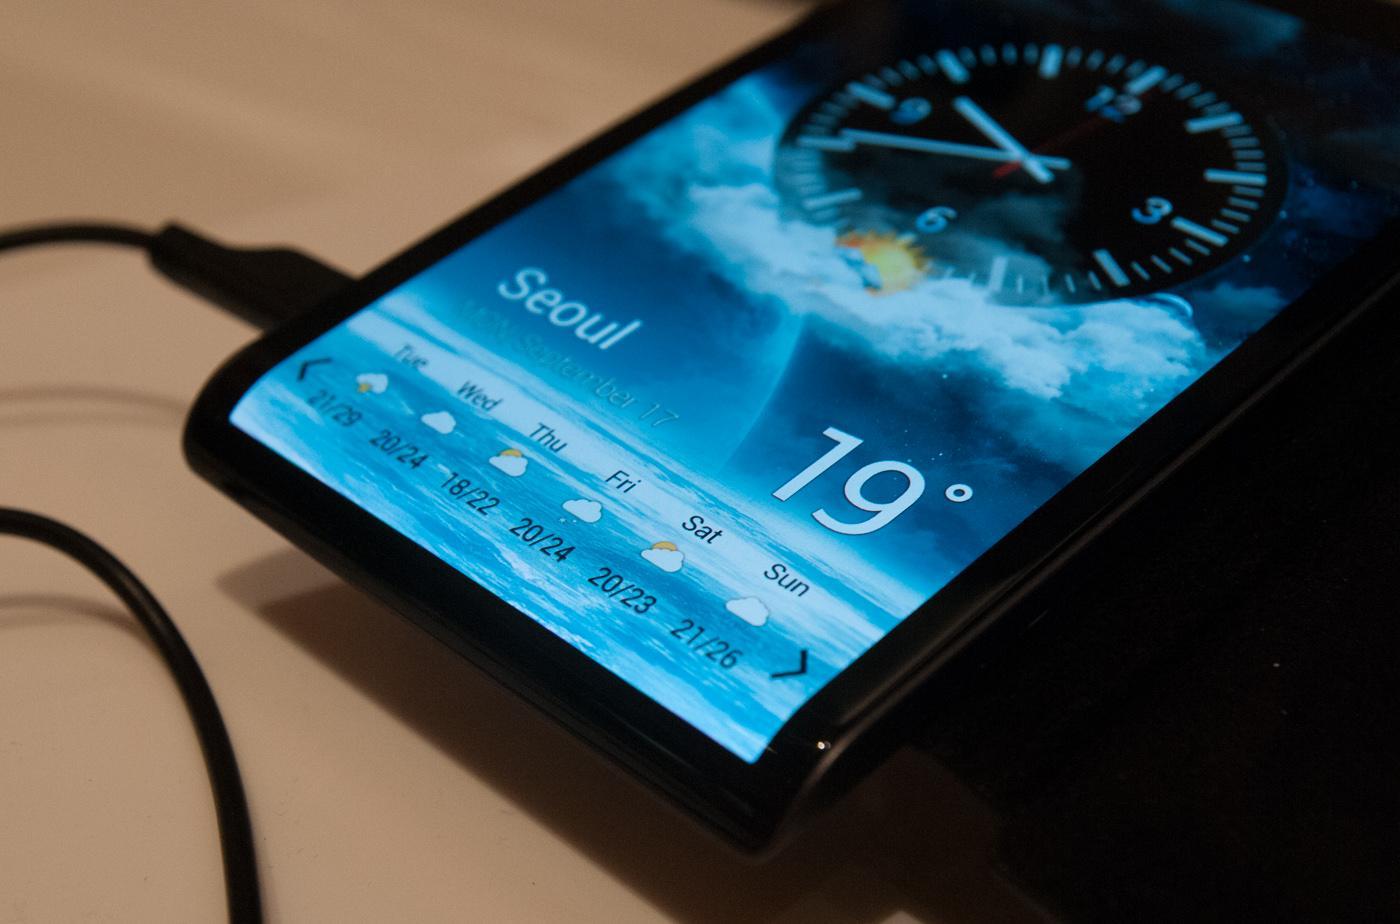 Samsung galaxy s5 unveiled - Samsung Galaxy S5 Unveiled 22